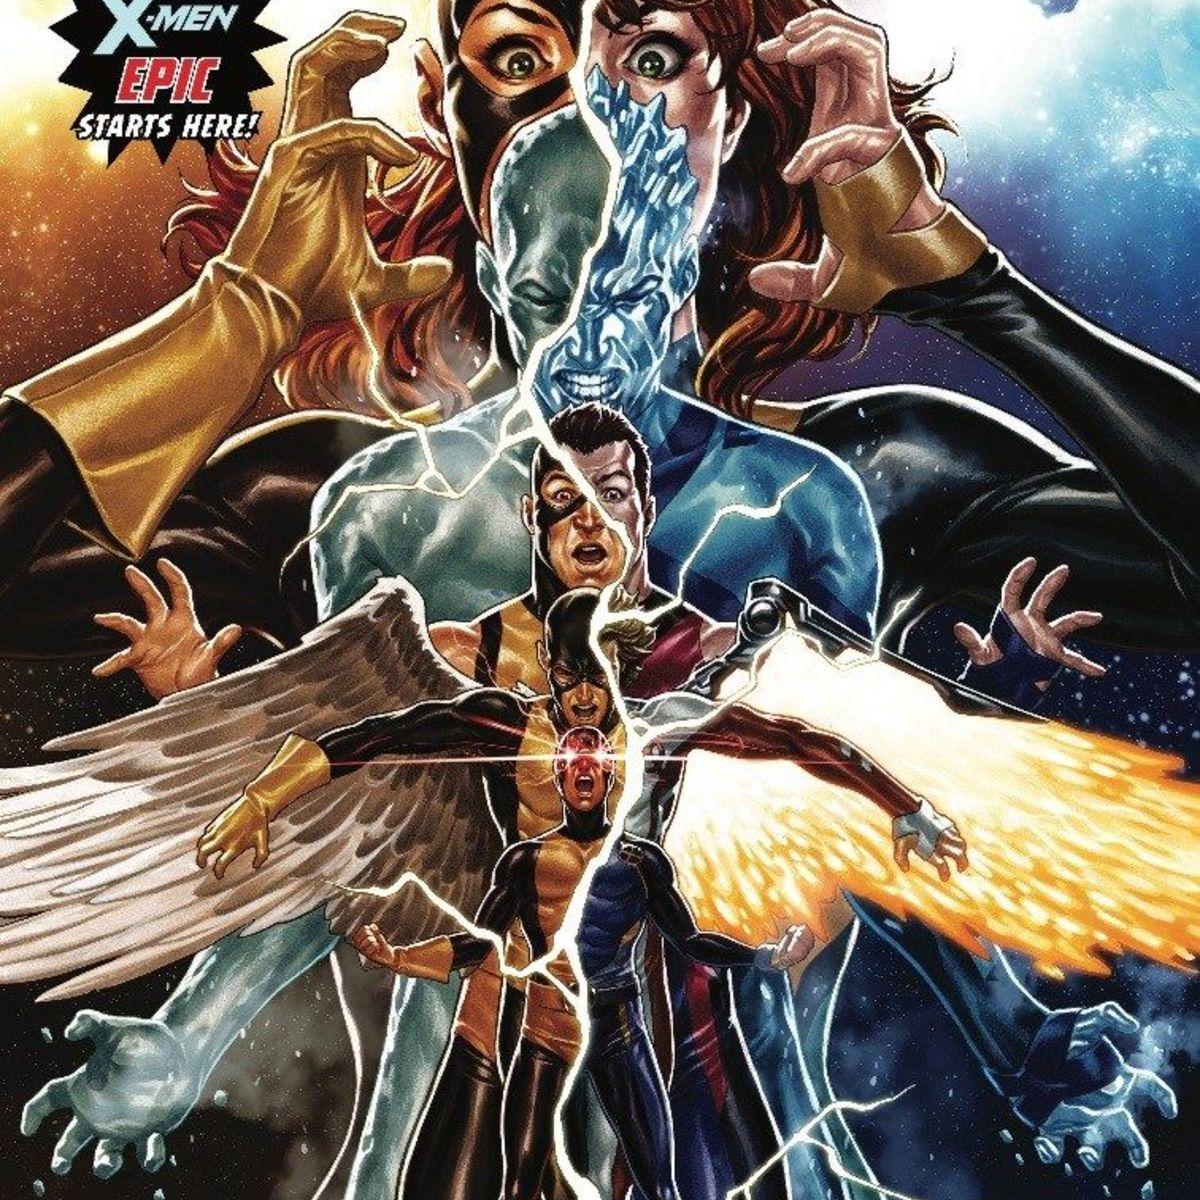 Extermination Vol 1 cover